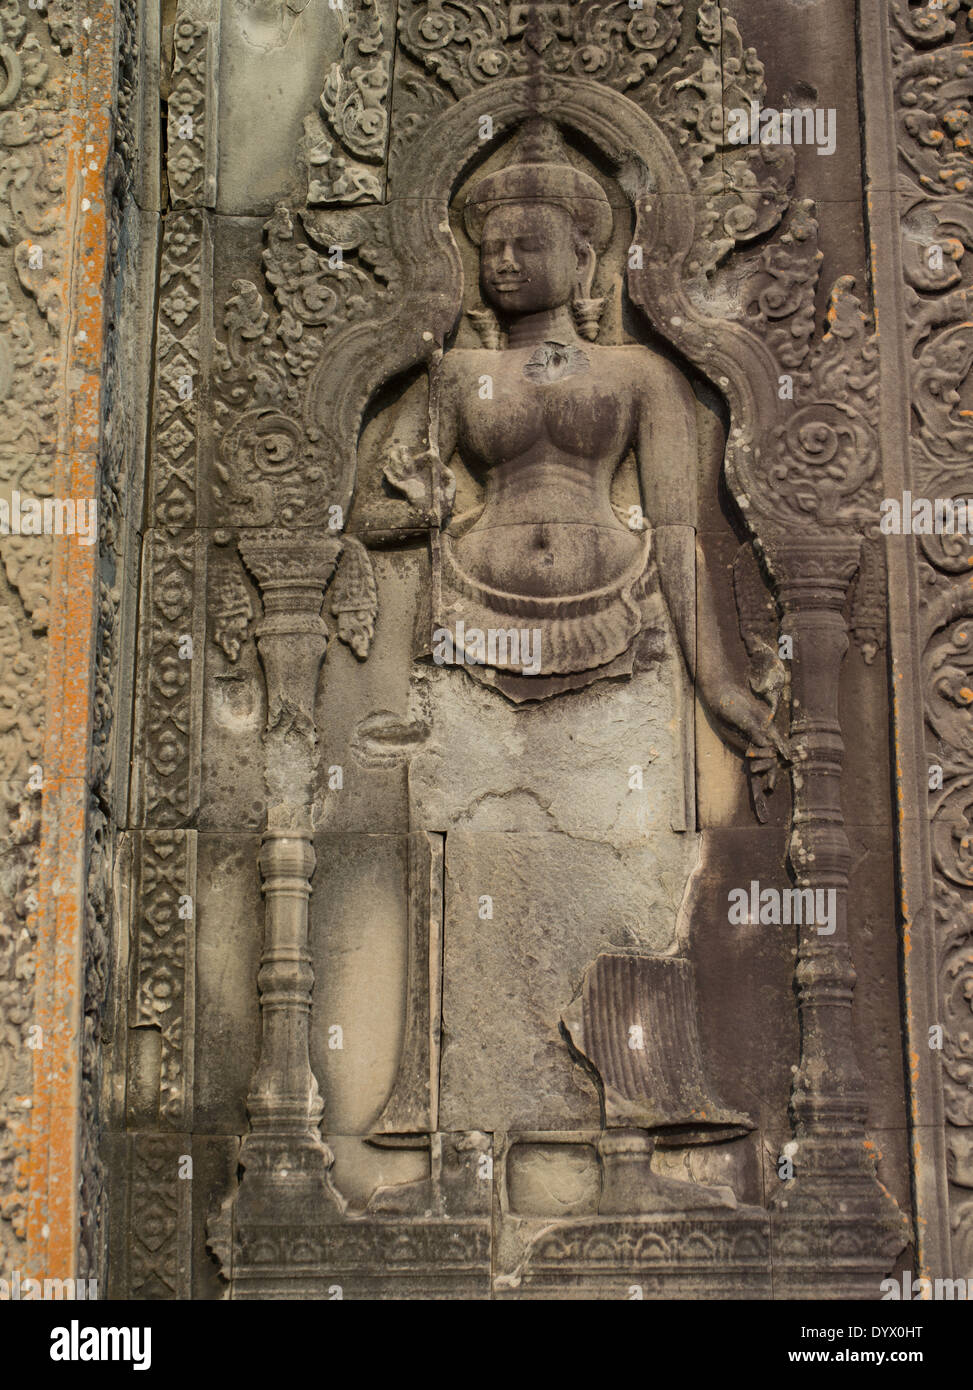 Il bassorilievo di carving Apsara in arenaria a Phnom Bakheng, Siem Reap, Cambogia Immagini Stock